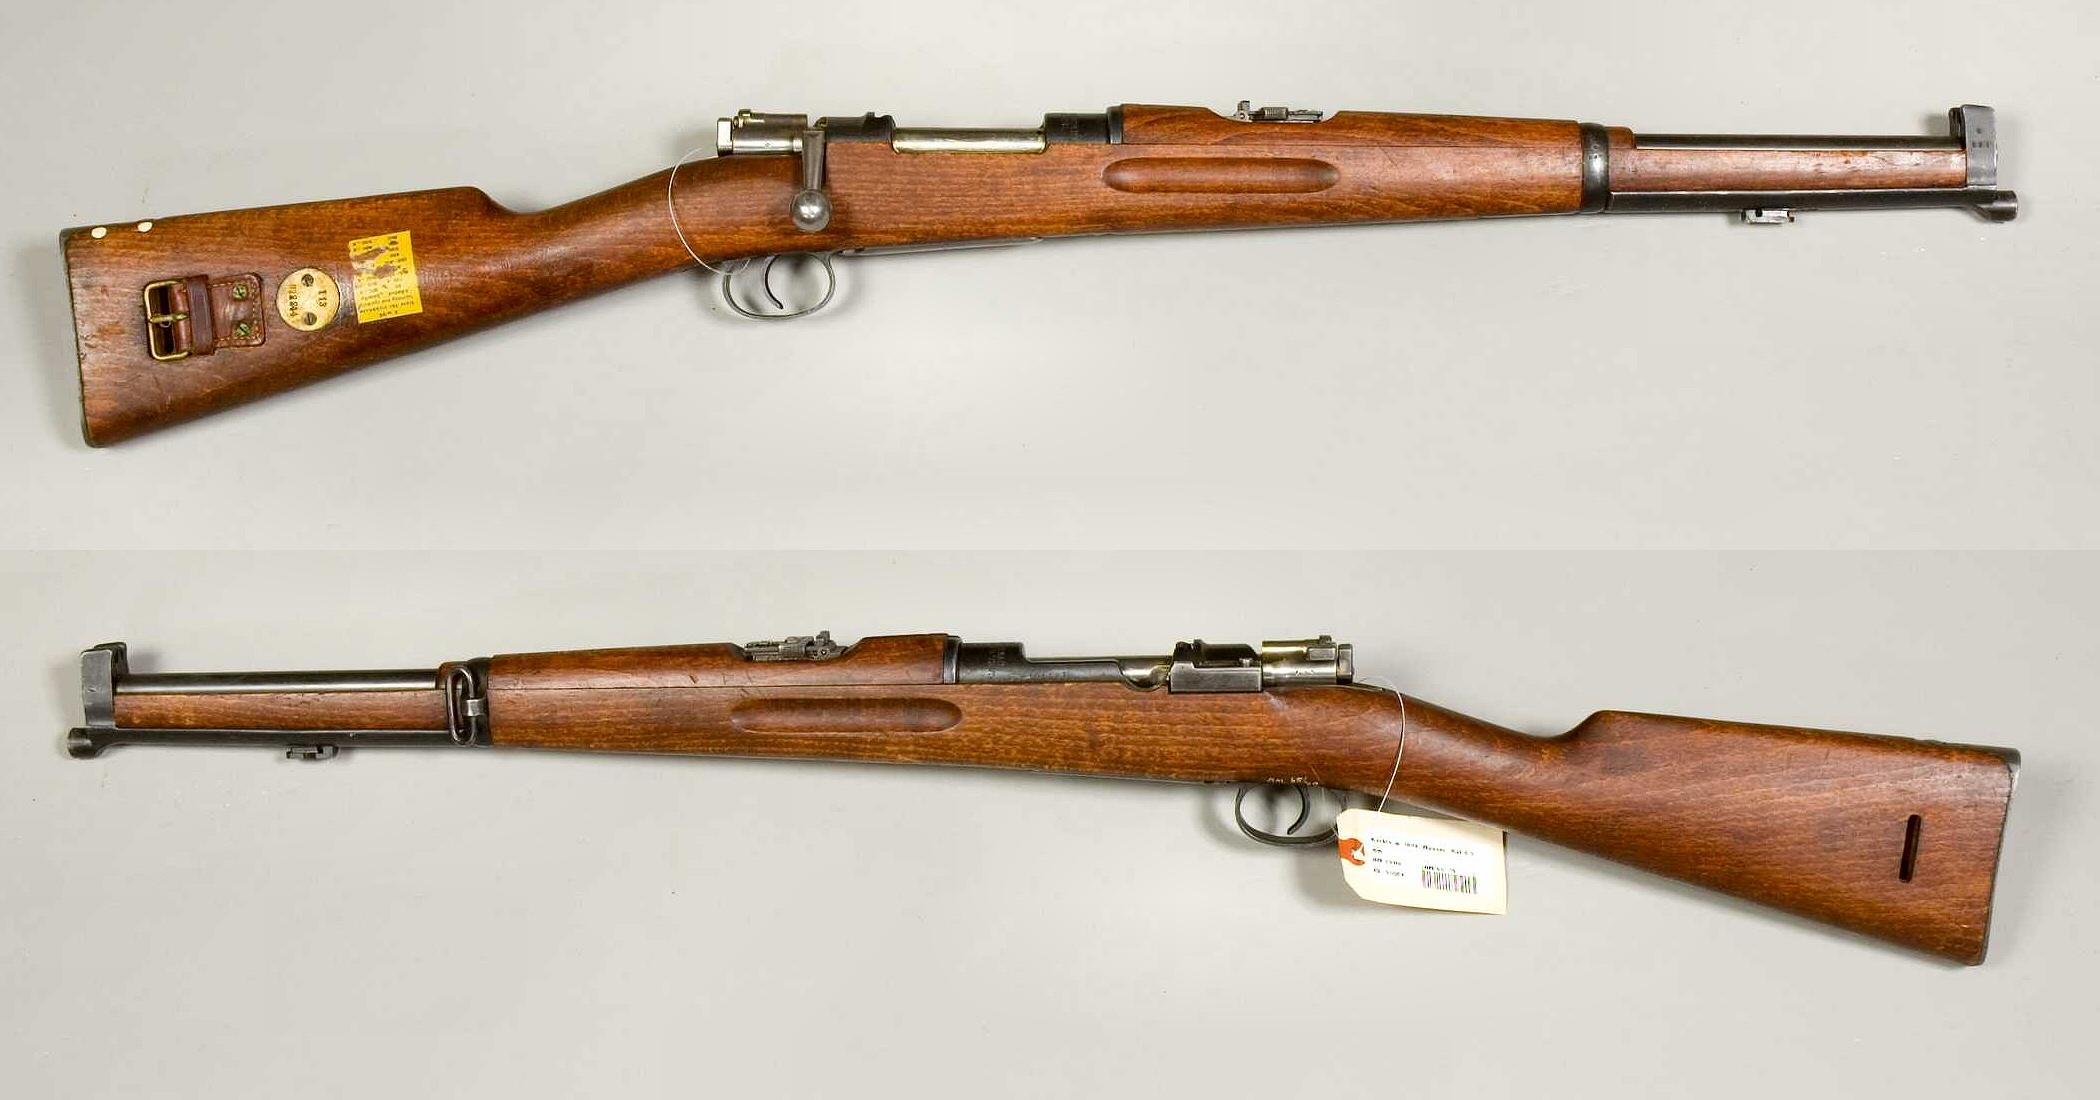 File Karbin M 1894 6 5x55mm Arm 233 Museum Jpg Wikimedia